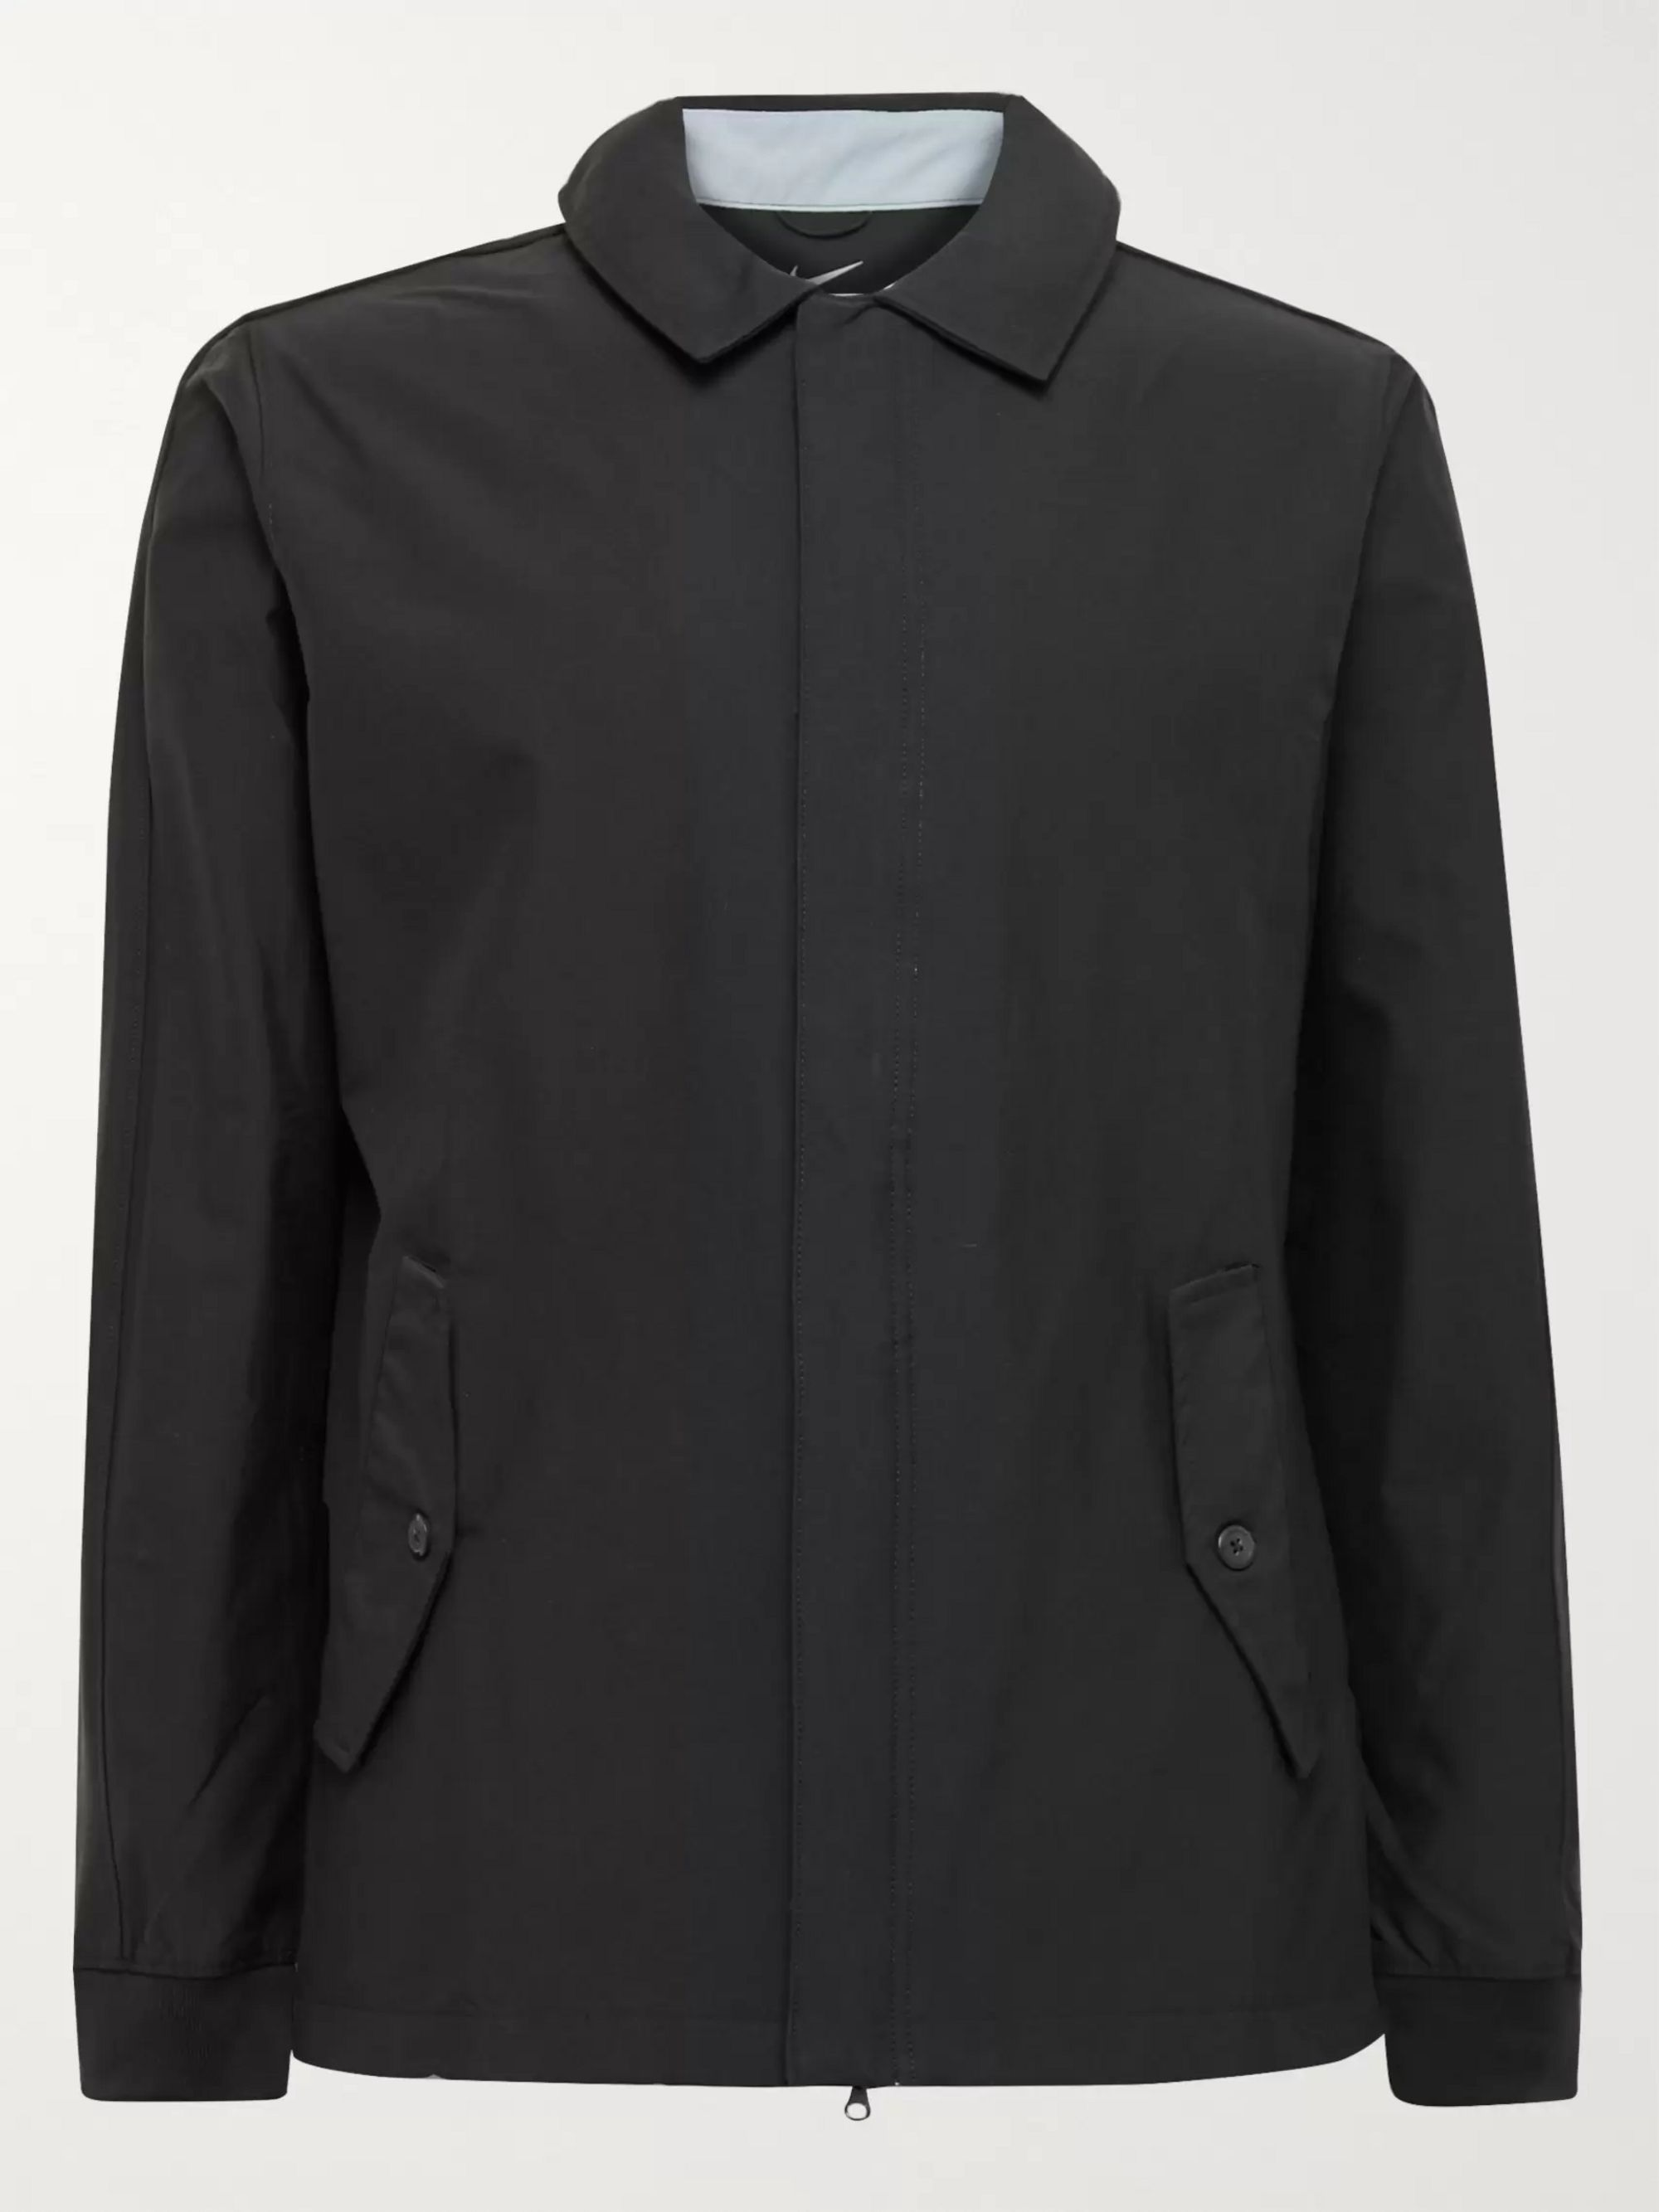 Nike Golf Repel Player Stretch-Nylon Zip-Up Golf Jacket